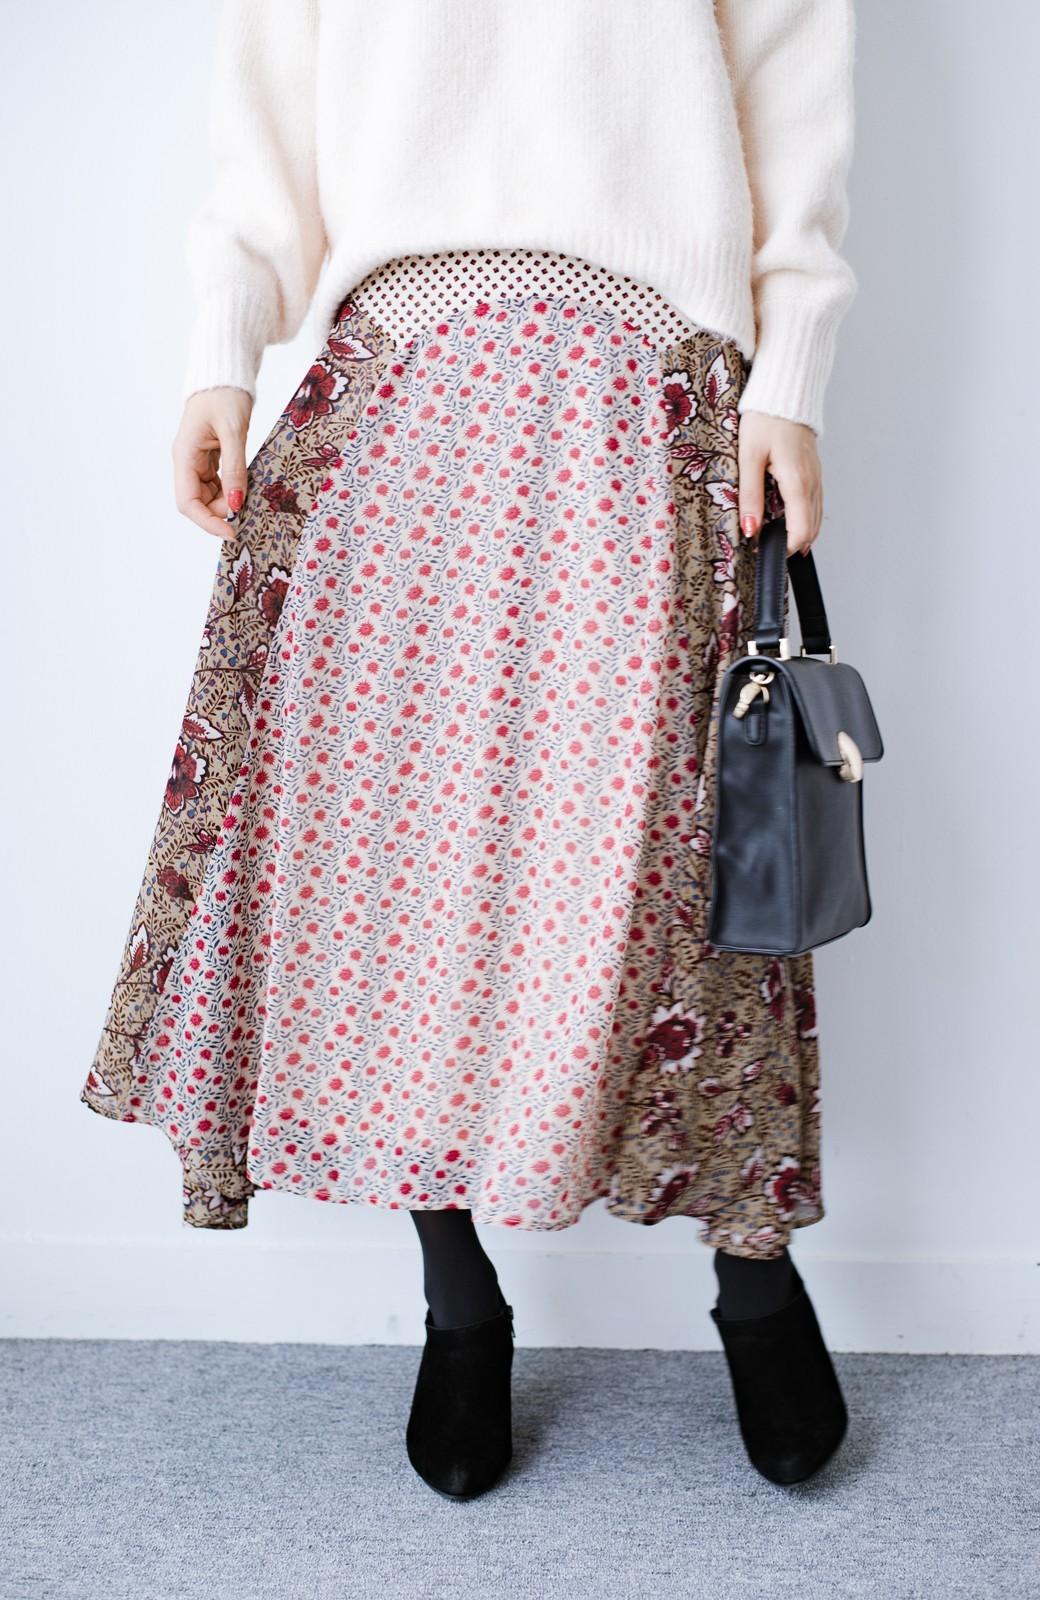 haco! 【洗濯機洗いOK】シンプルなトップスに合わせるだけでかわいくなれる MIX柄スカート <ベージュ系その他>の商品写真2